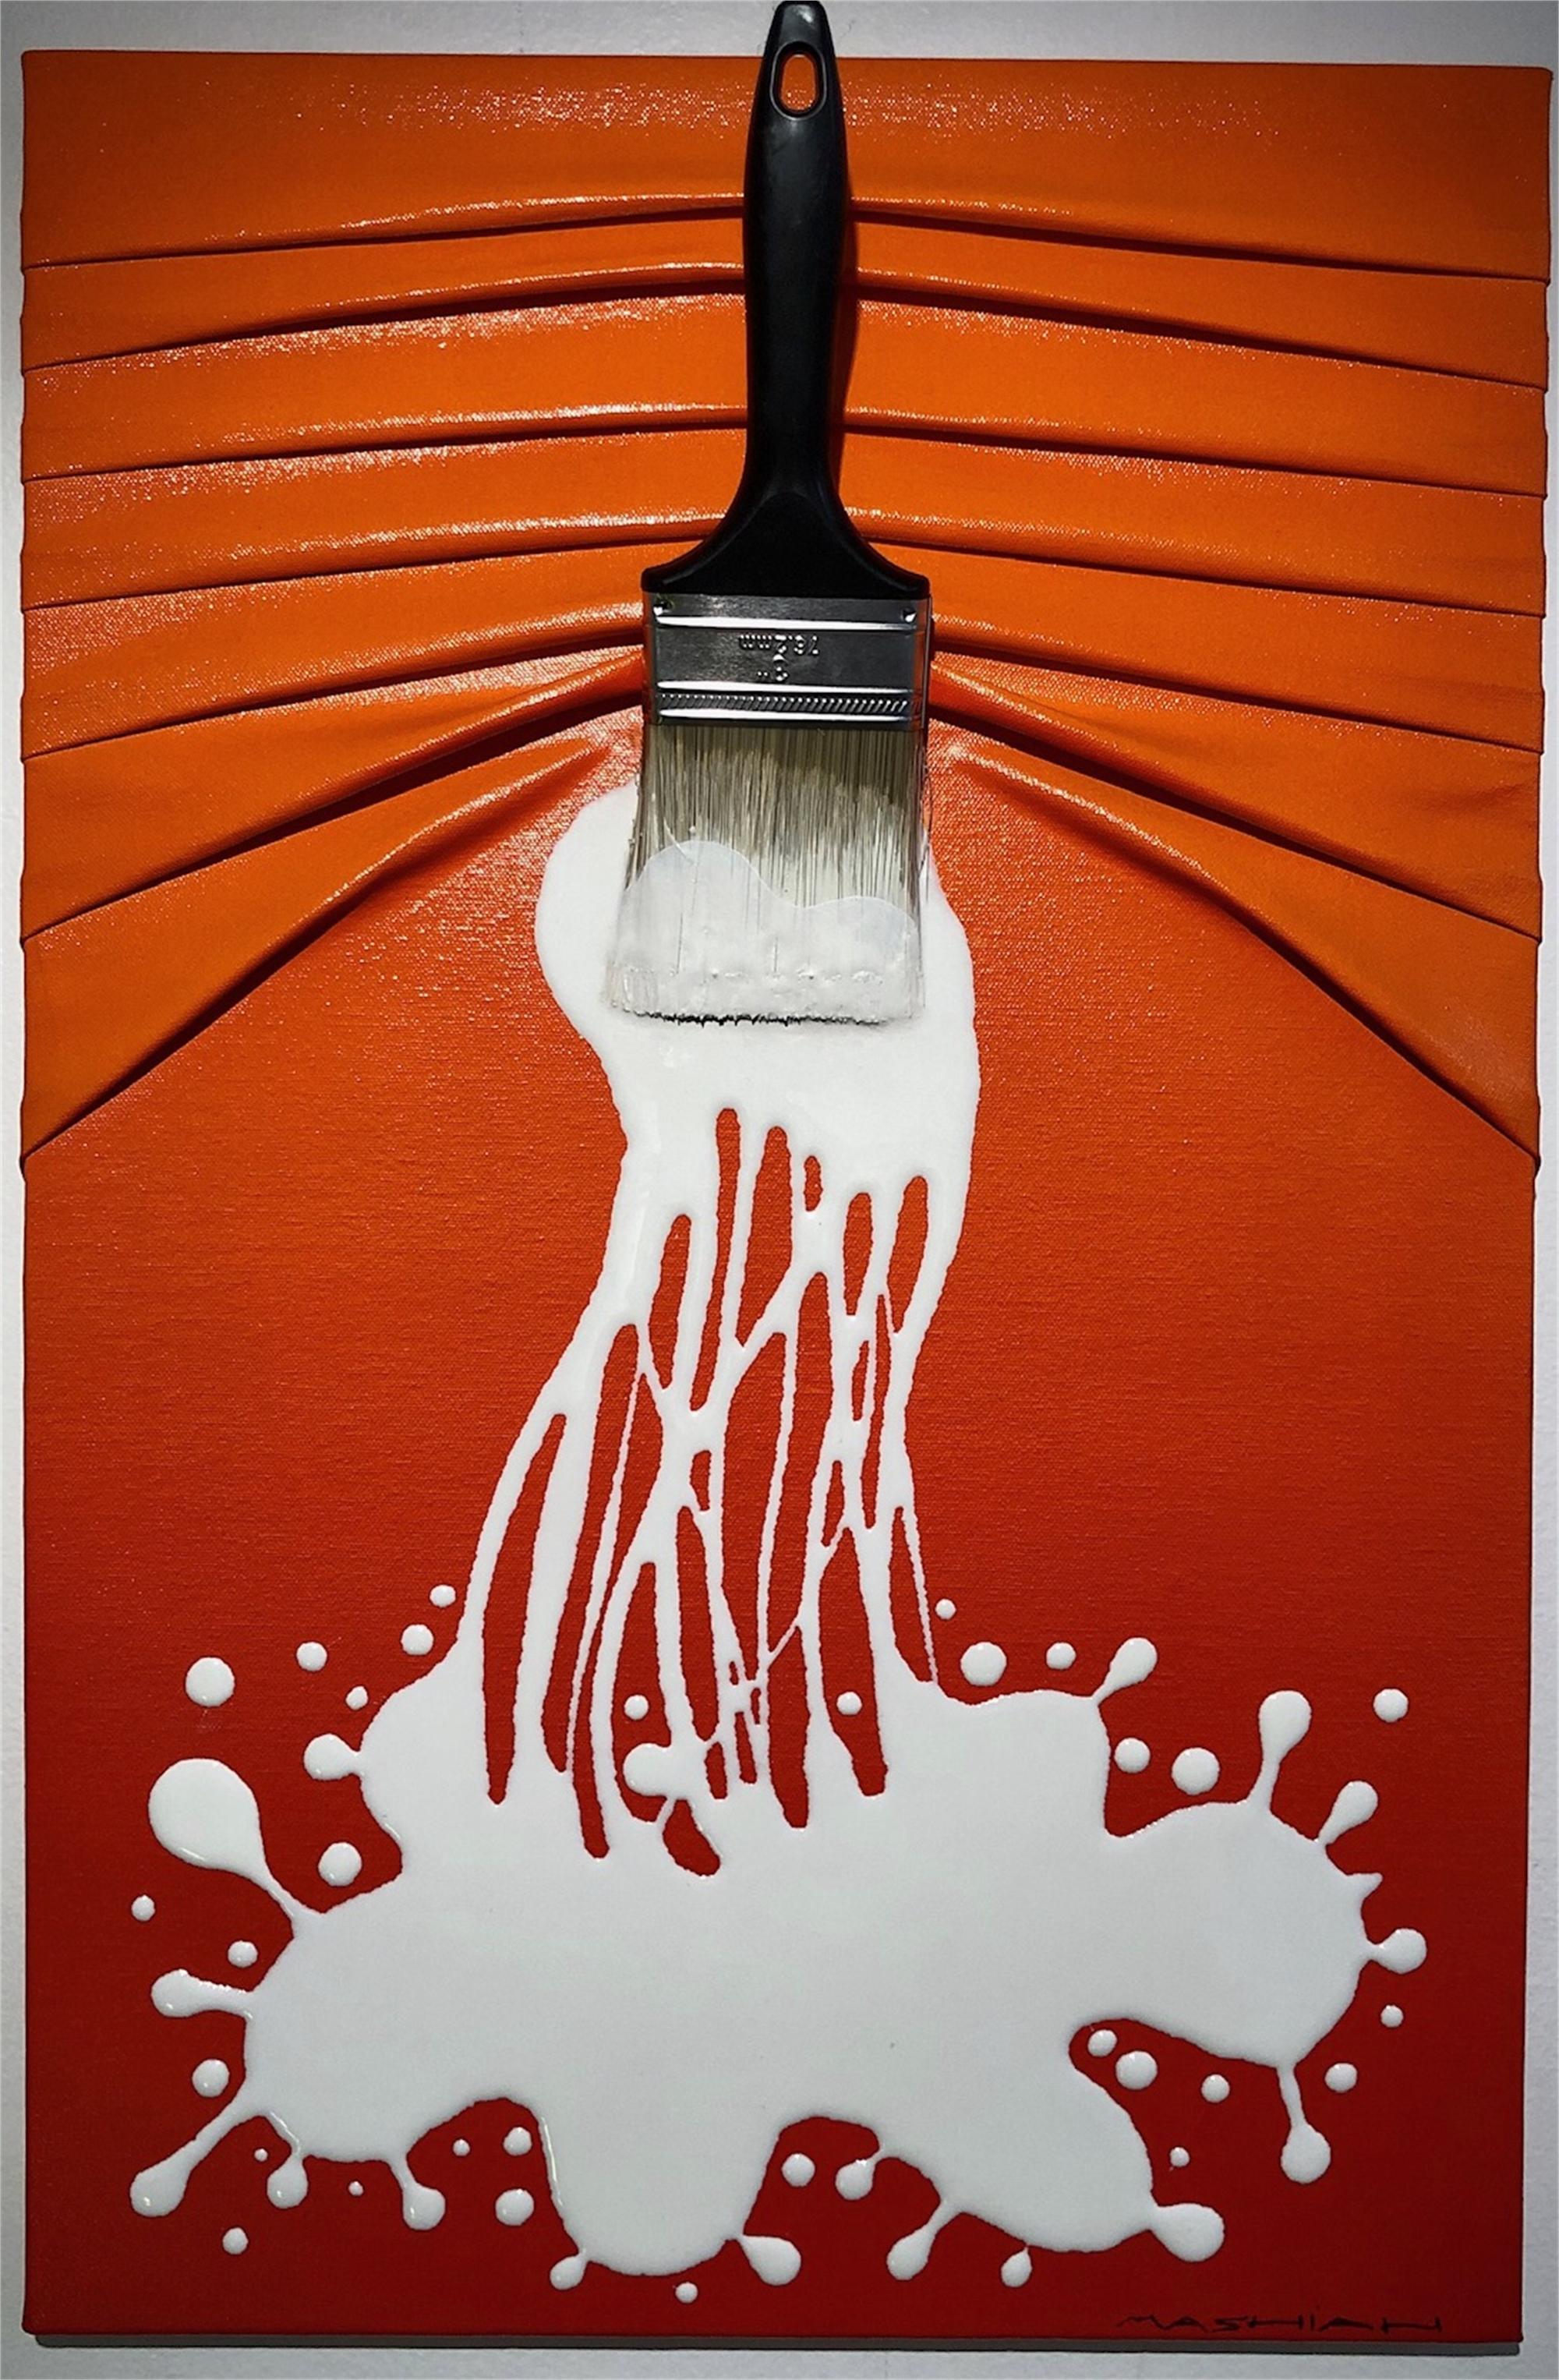 """Let's Paint"" small, White splash on Red by Efi Mashiah"